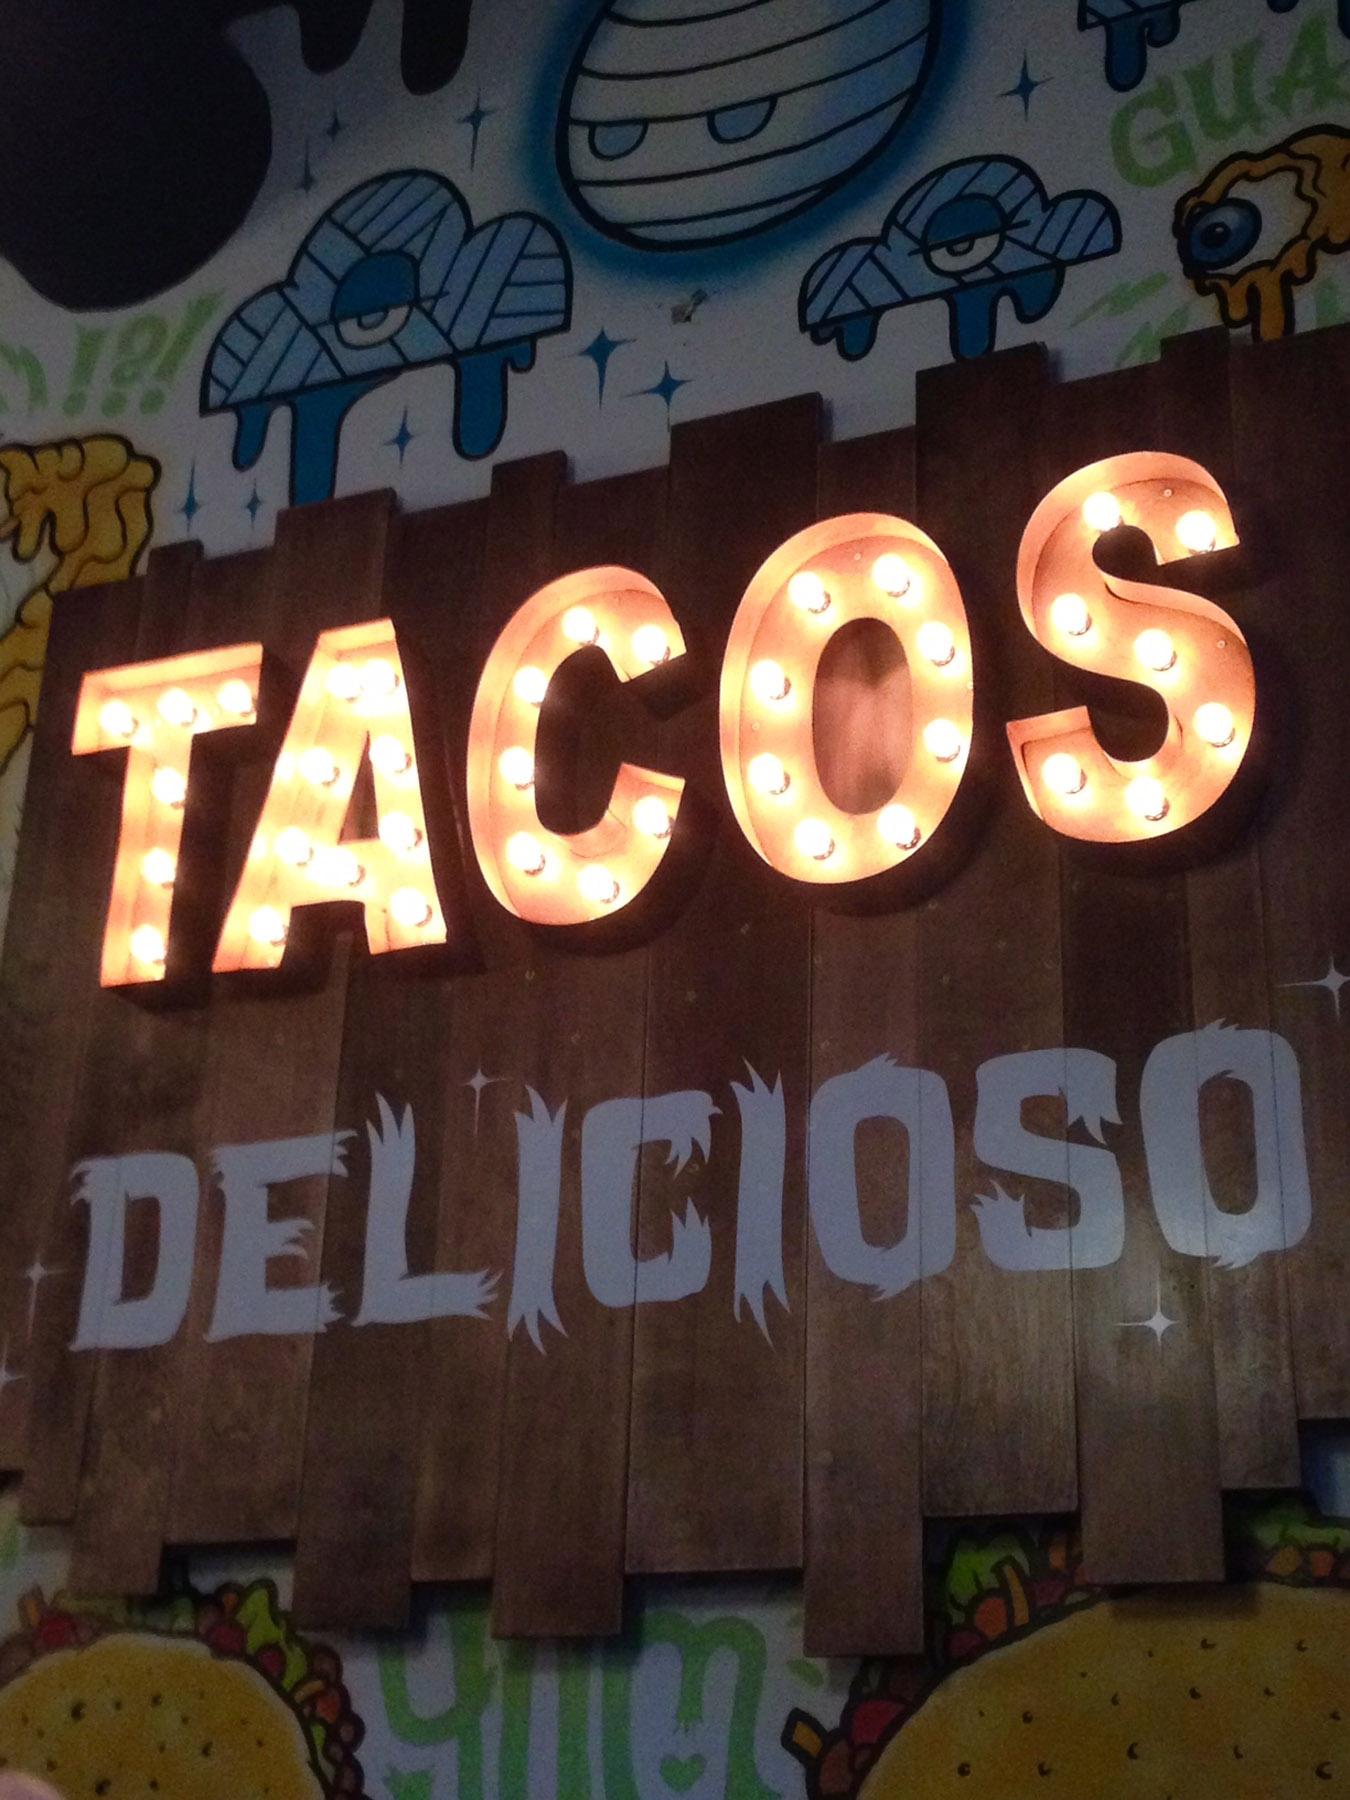 condado taqueria menu Menu items light the walls at the new Condado Taqueria.